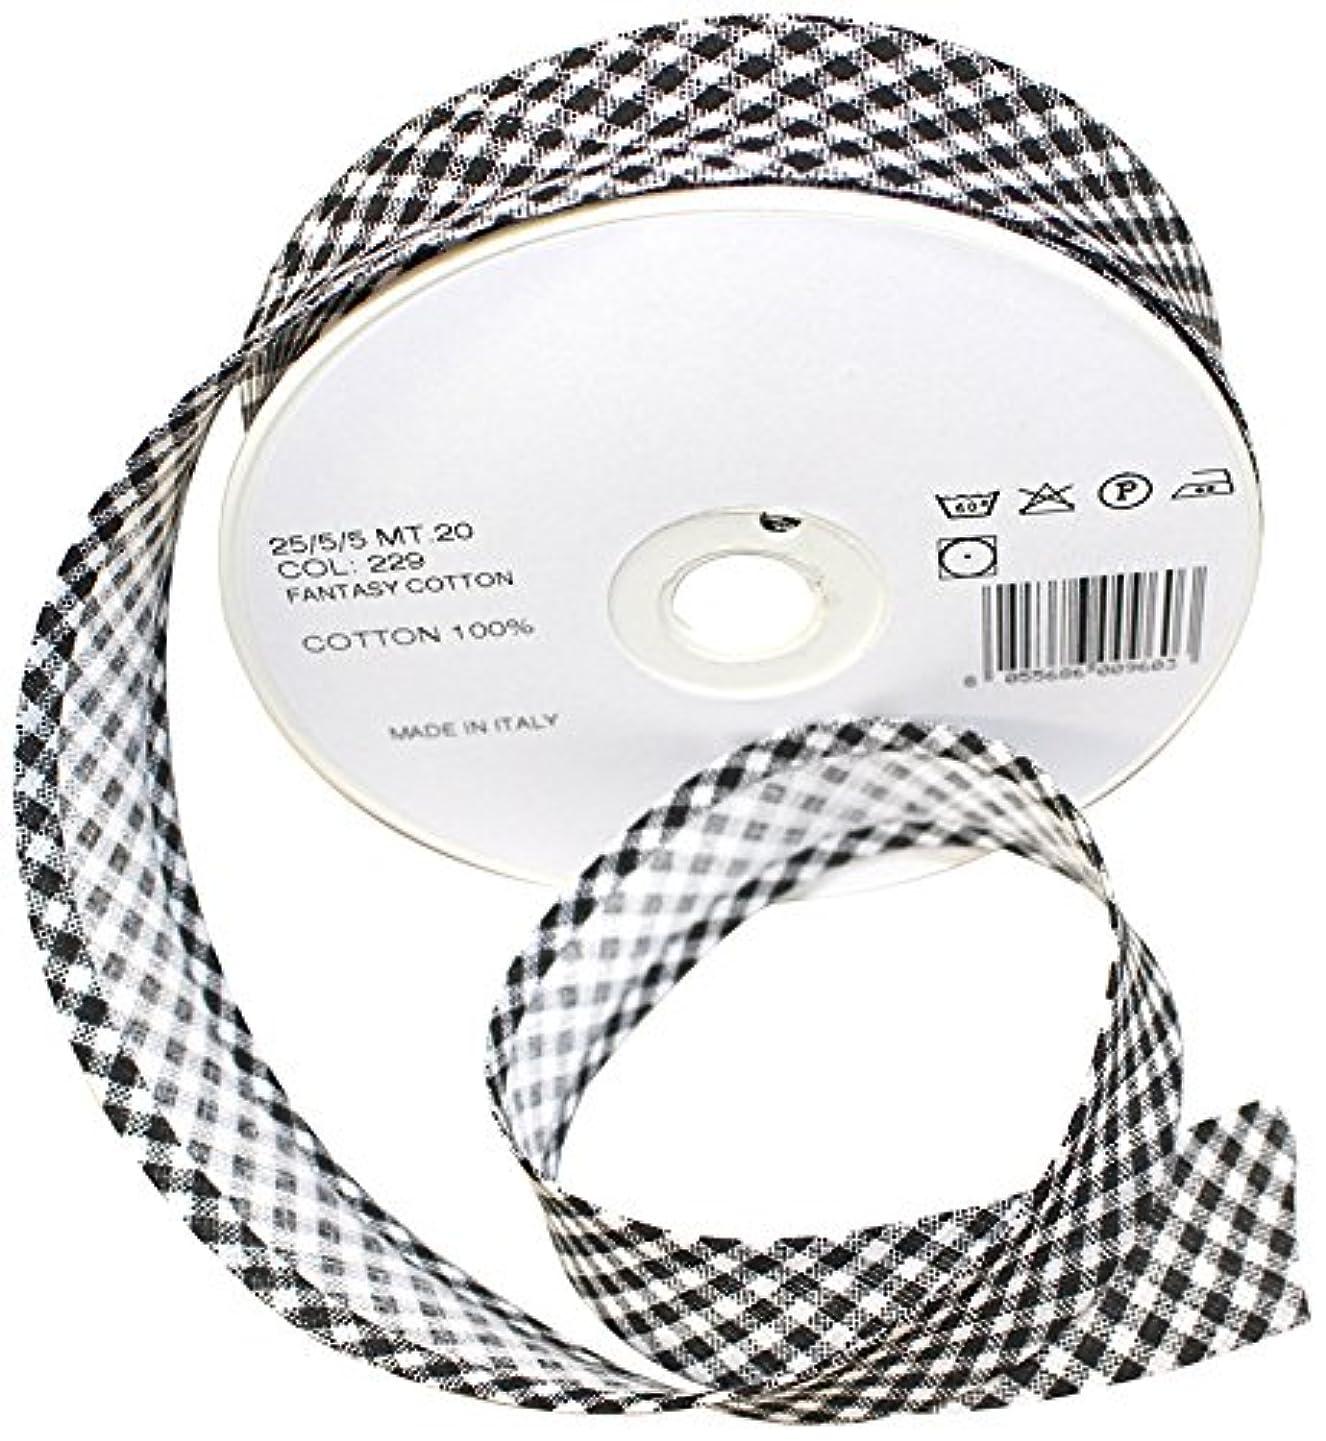 Inastri 25/5/5 mm Cotton Bias Binding 'Gingham', Black by Inastri